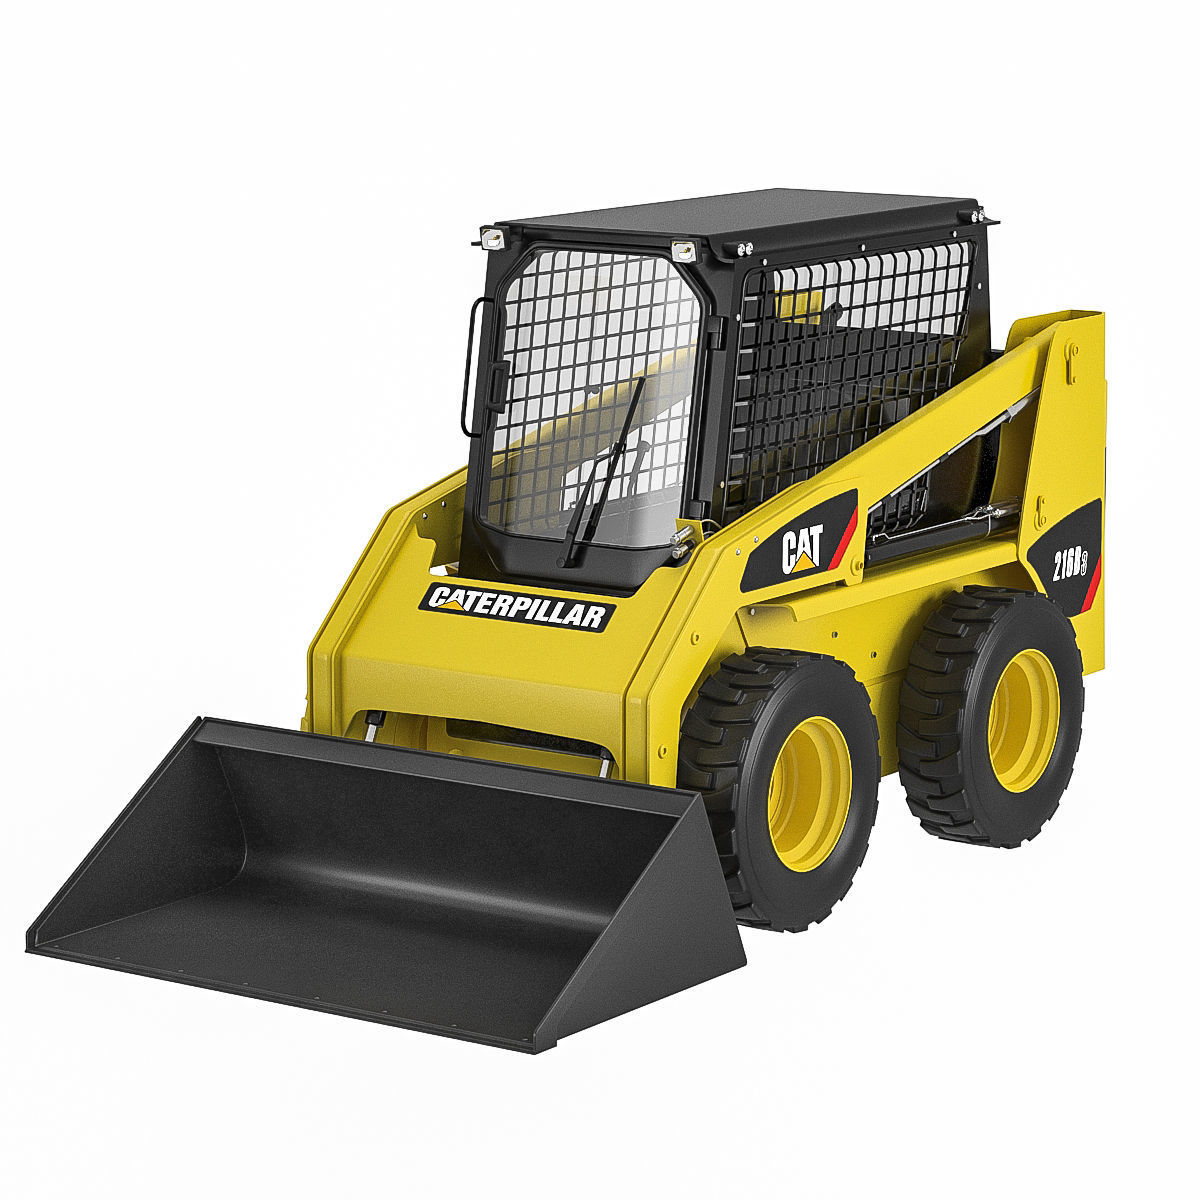 Skid steer loader CAT 216B